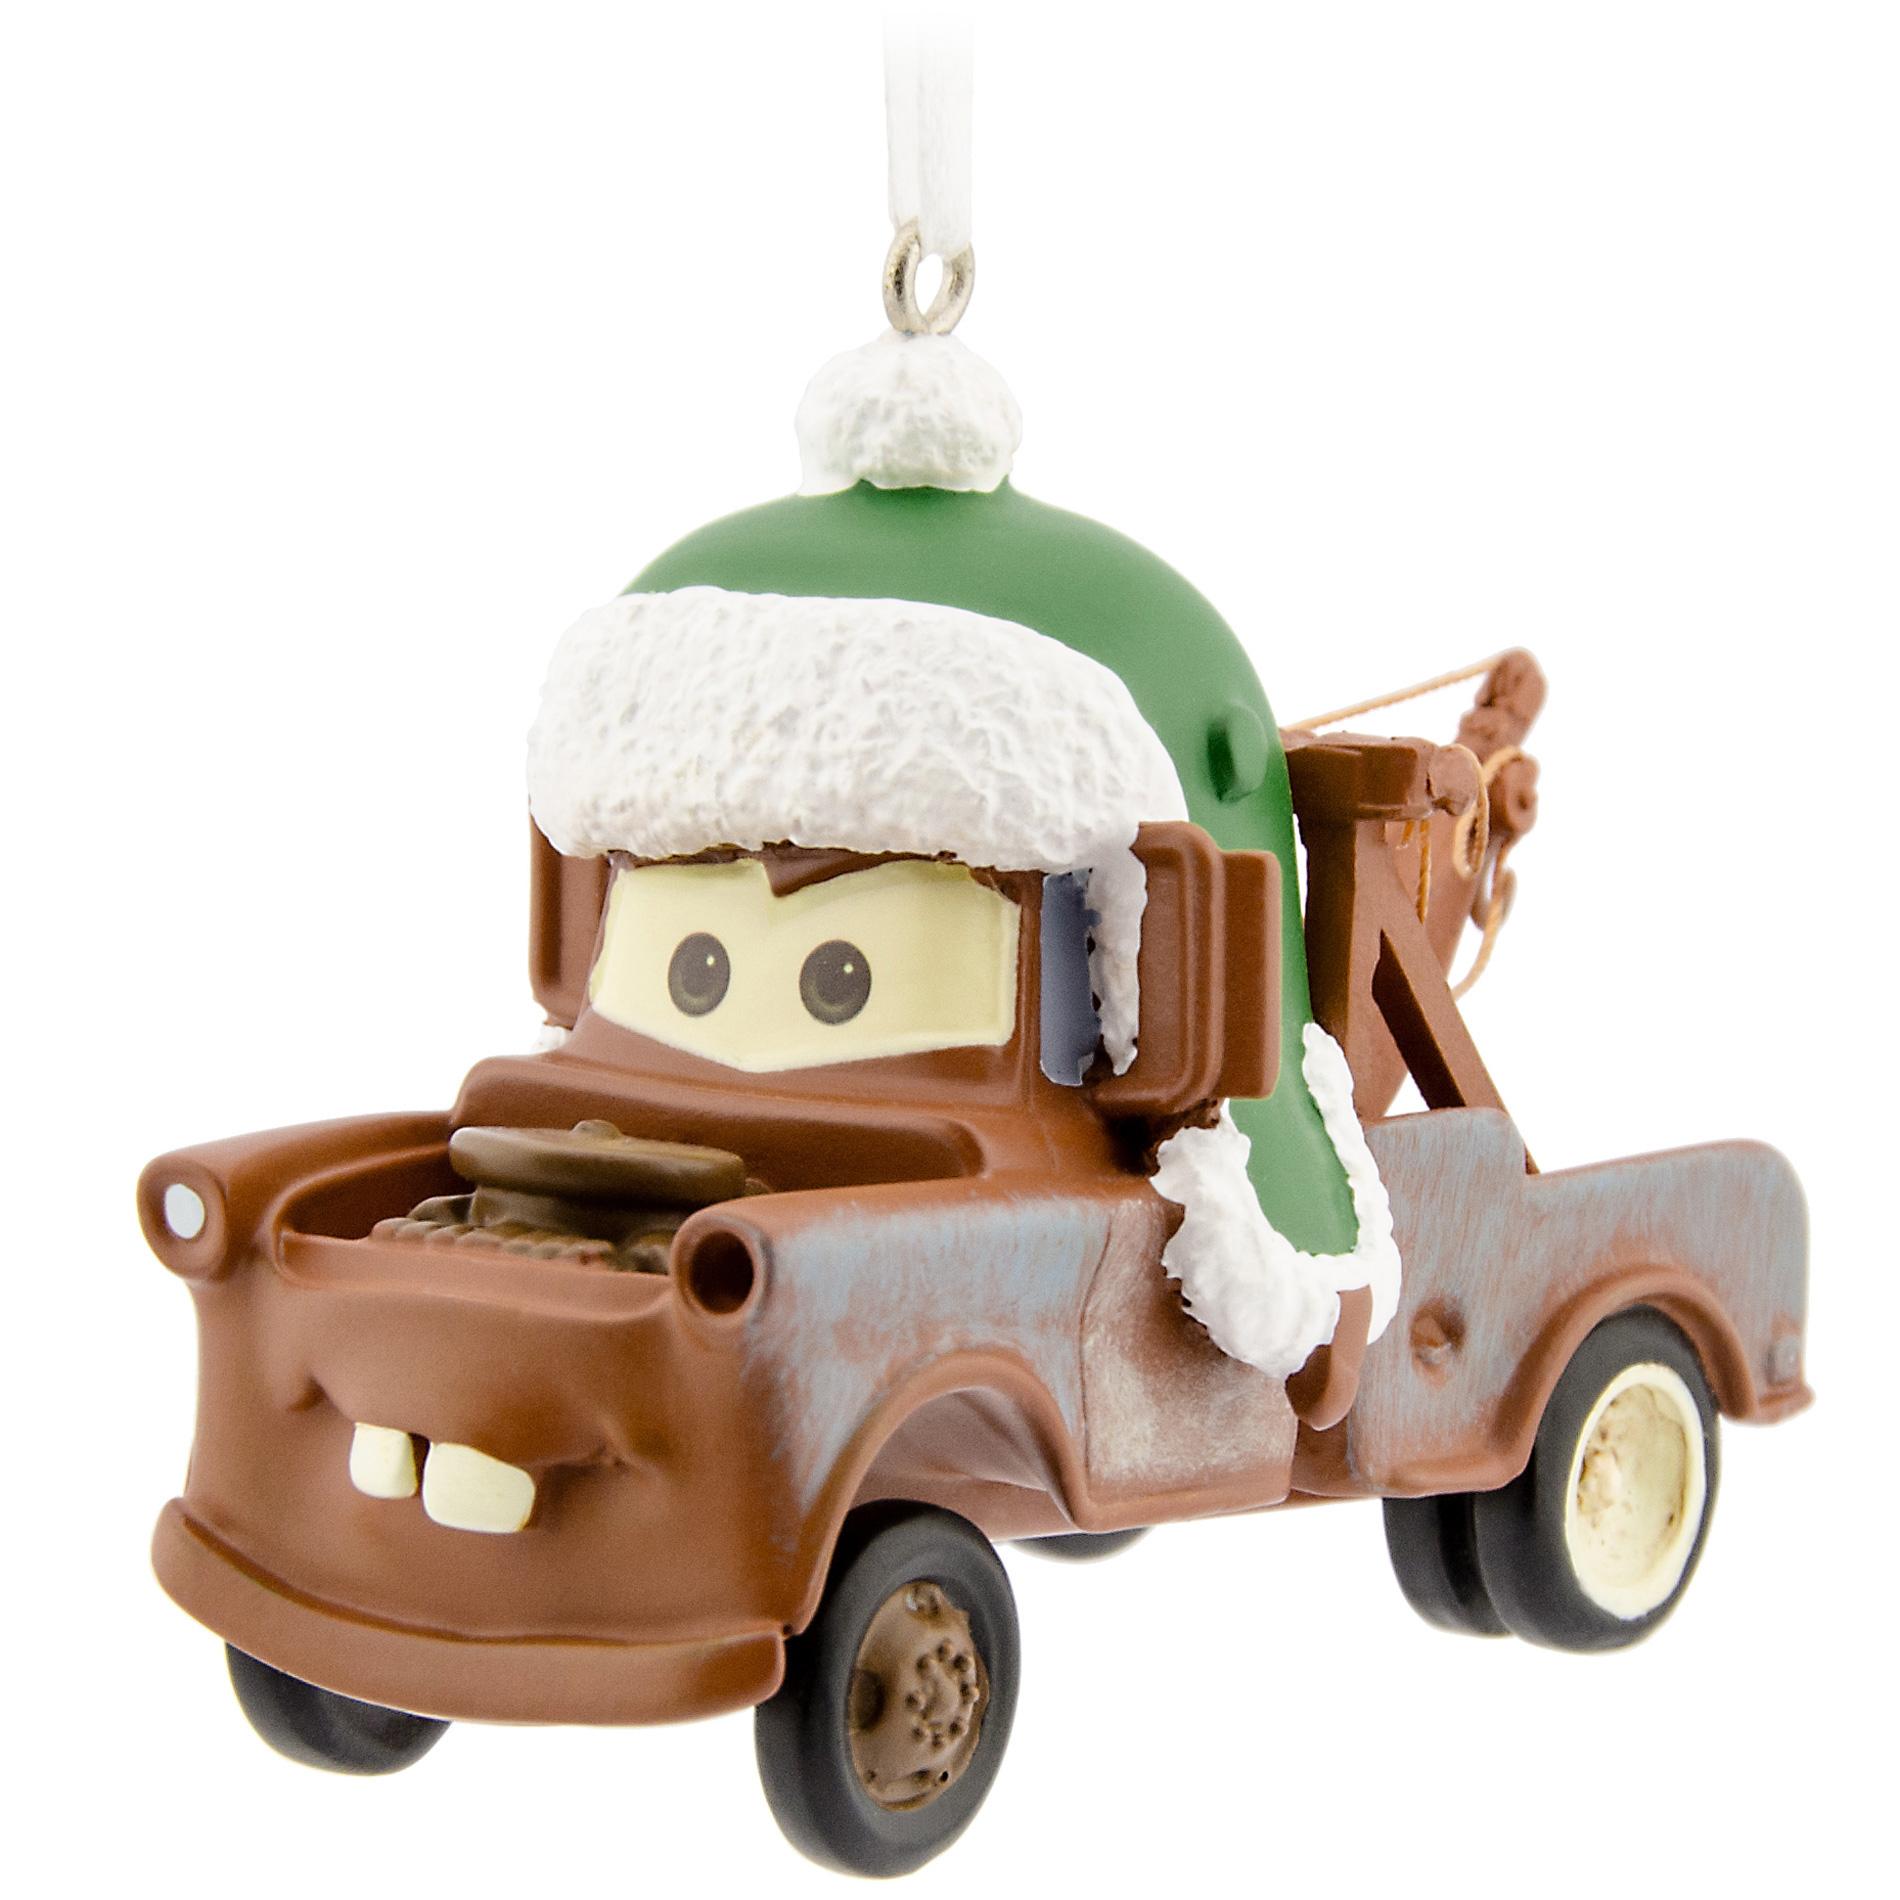 Hallmark DisneyPixar Cars Tow Mater Christmas Ornament